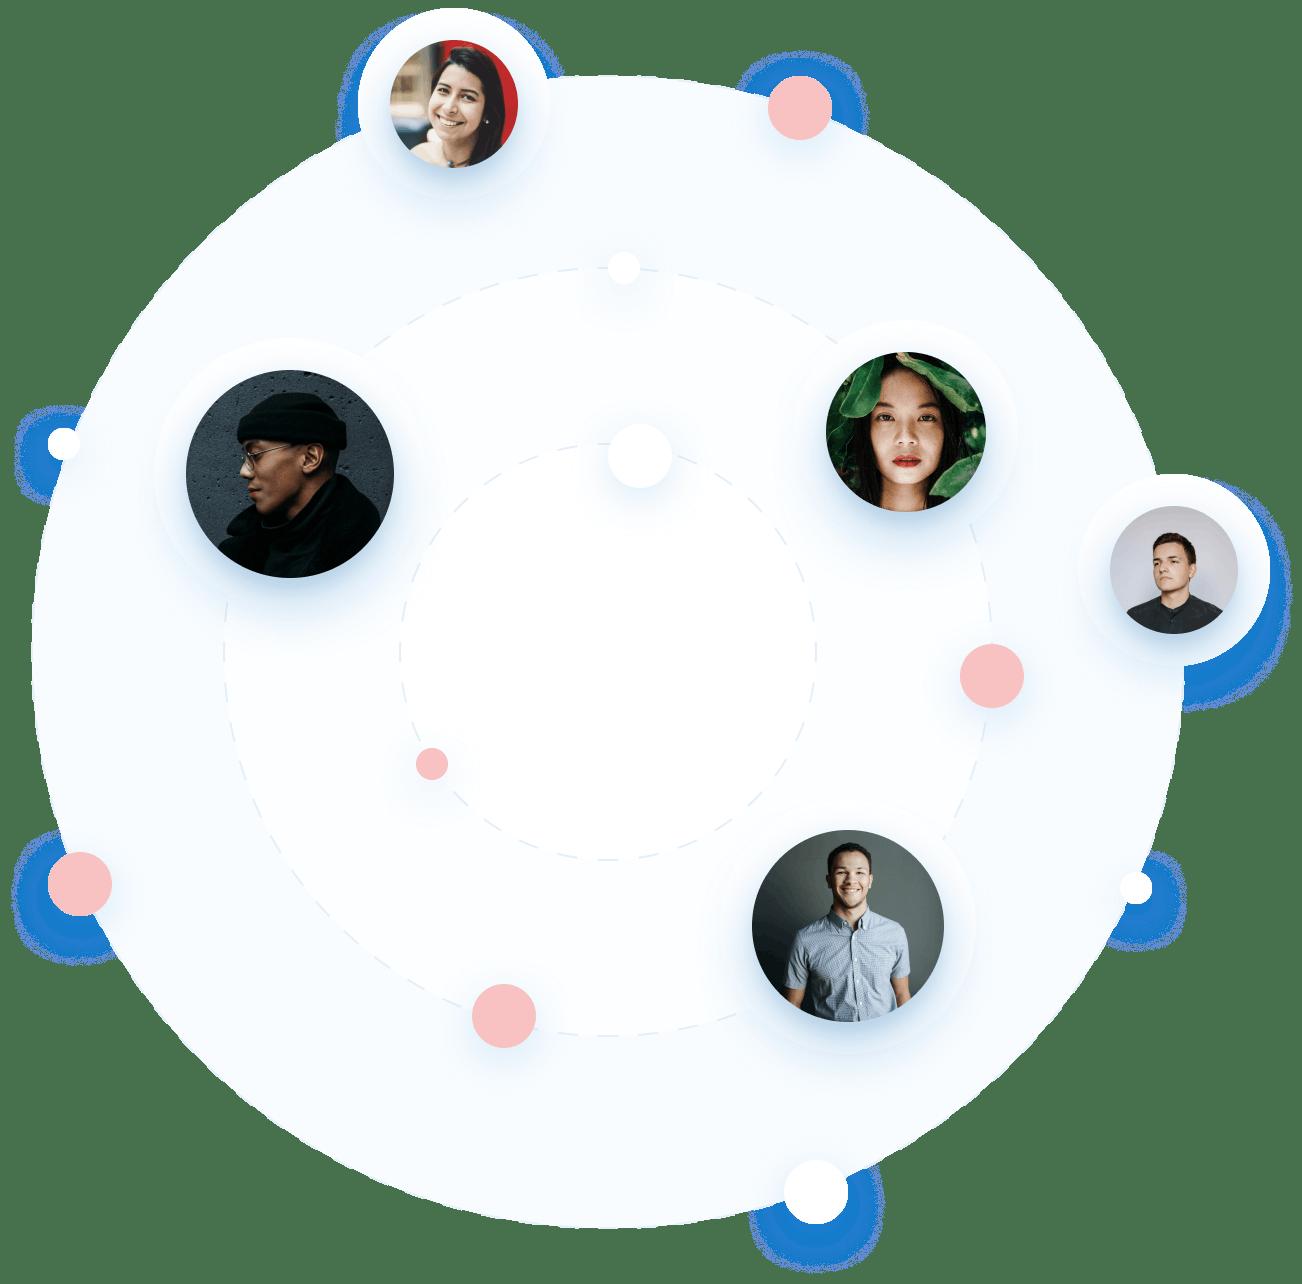 Java Development Services - globe